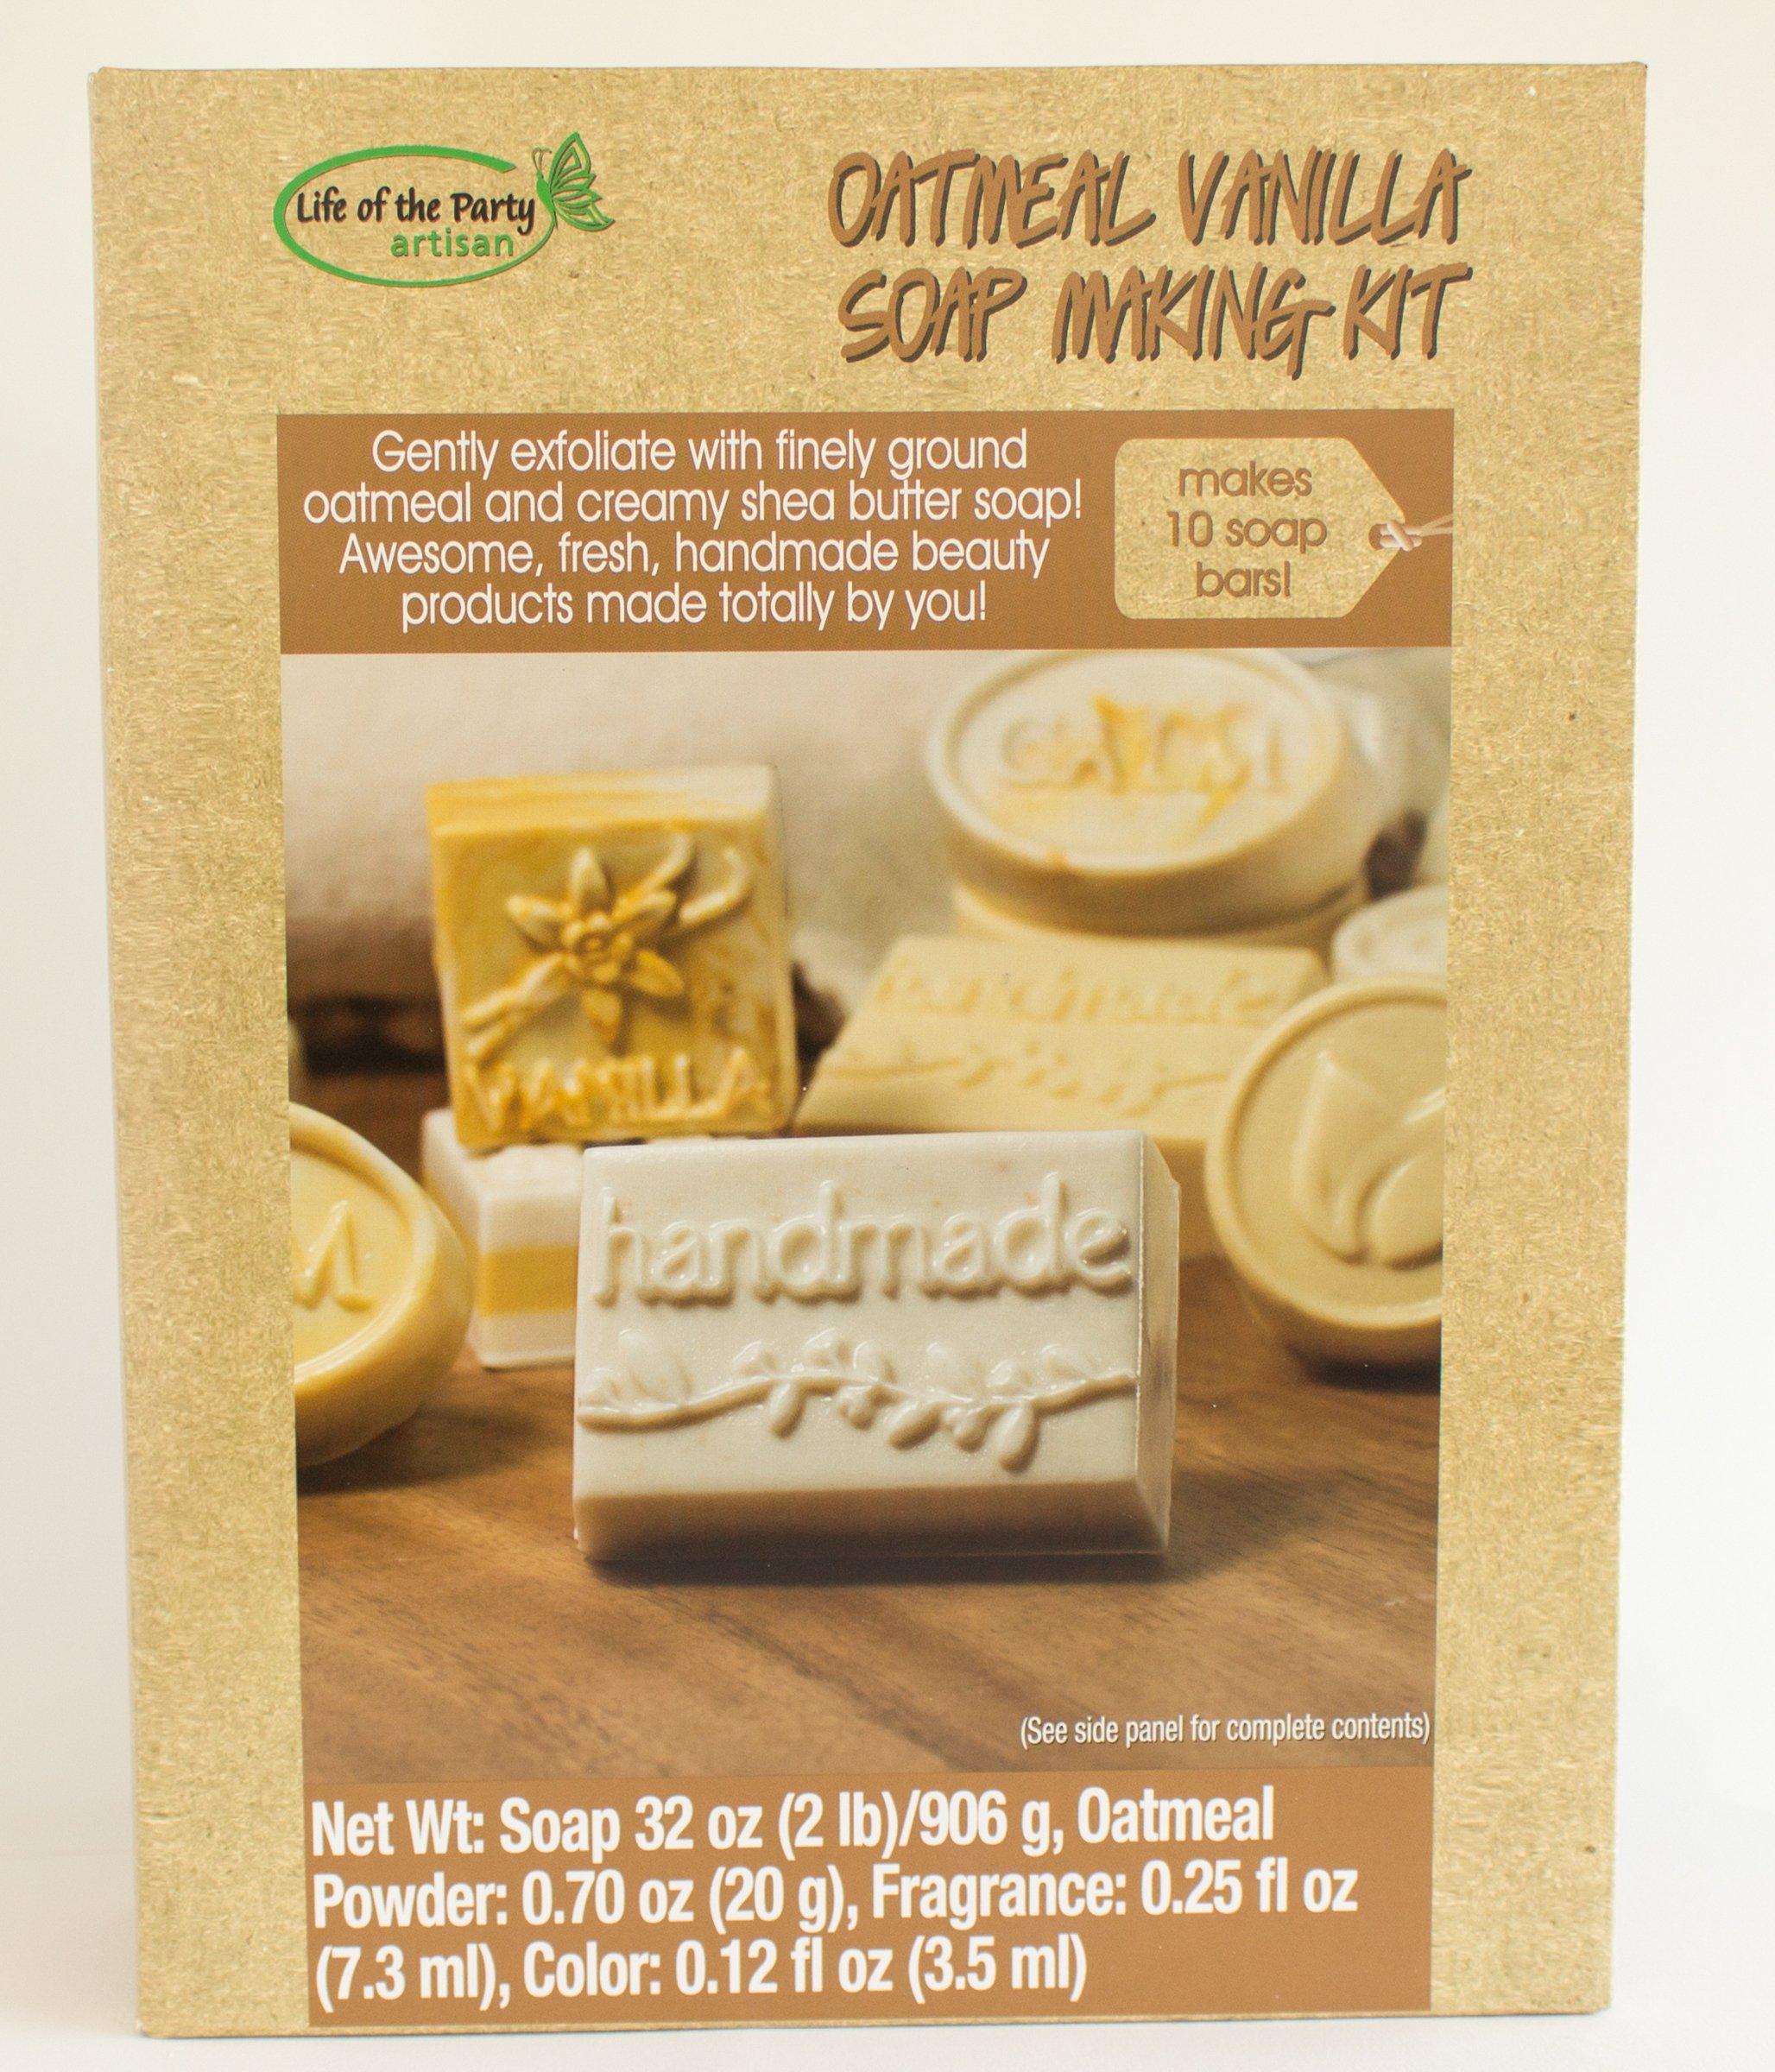 Life of the Party Oatmeal Vanilla Soap Making Kit, 57049